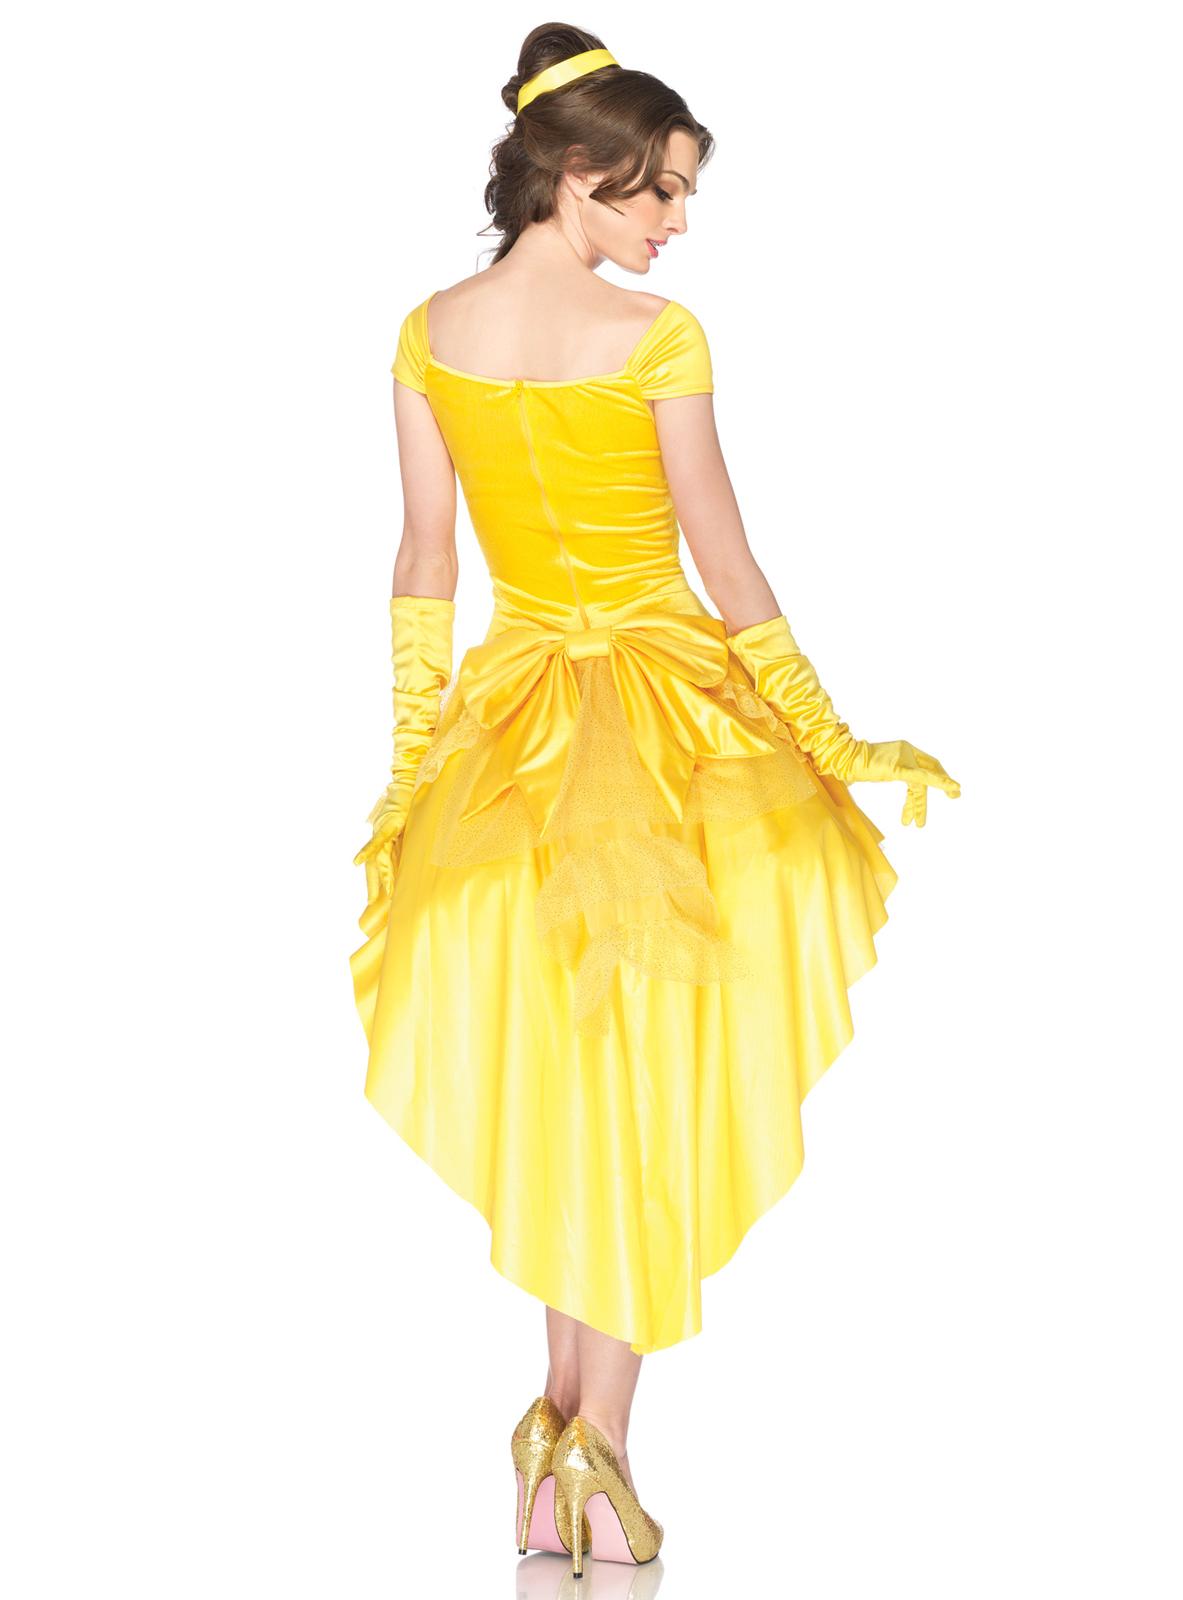 Disney Princess Belle Costume Adult